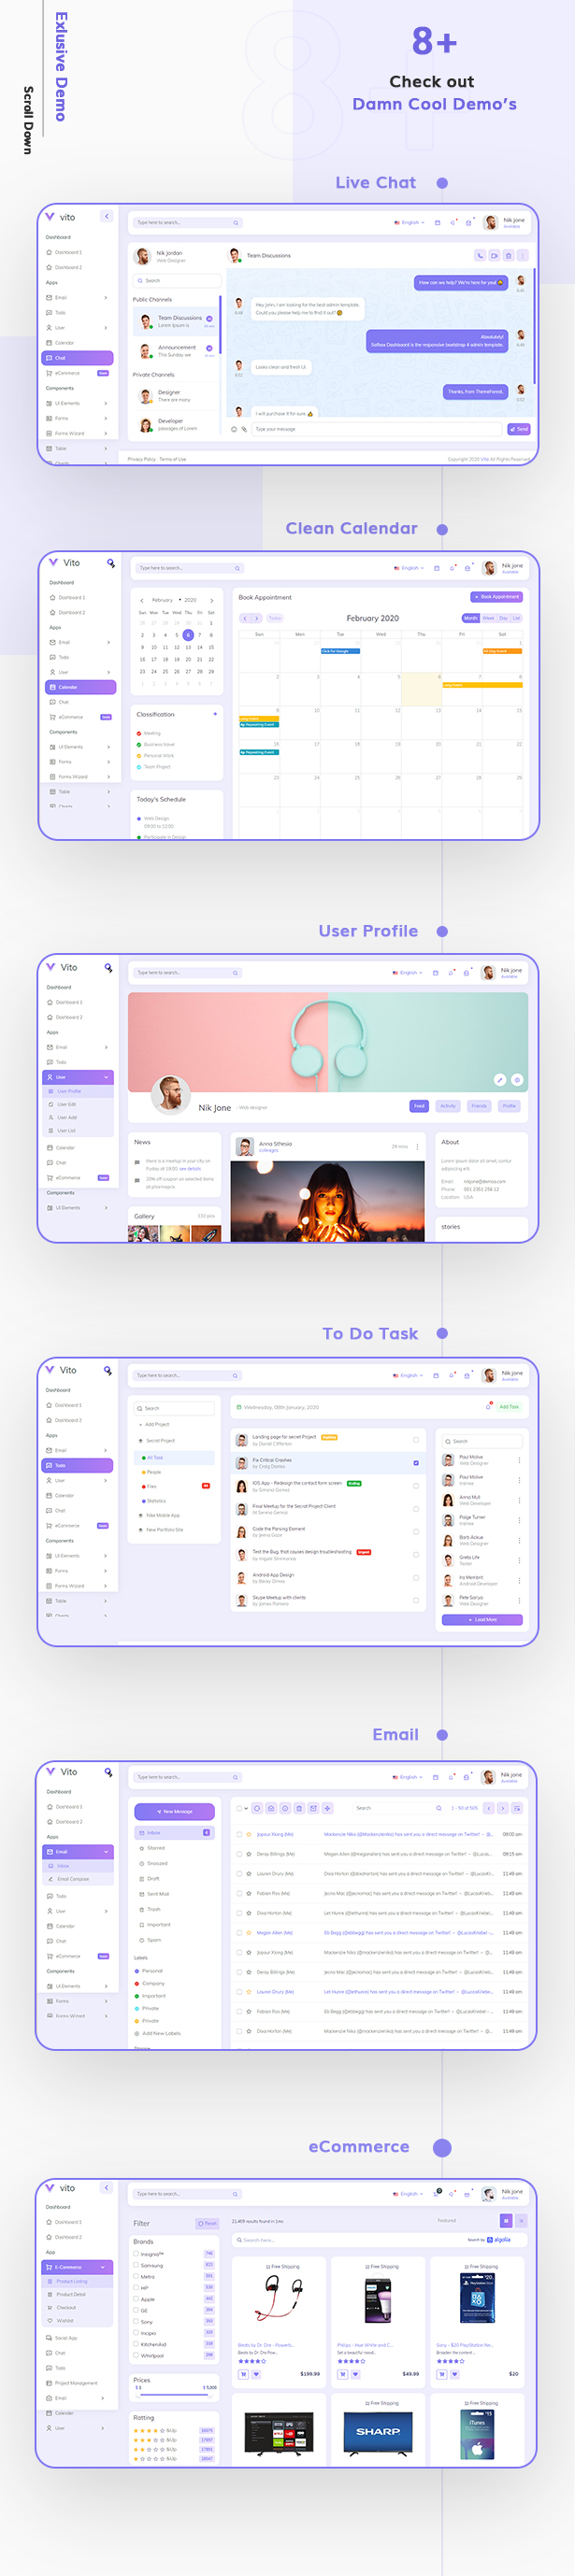 Vue Laravel HTML Admin Dashboard Template | Vito | Iqonic Design vue laravel html admin dashboard template Vito 91